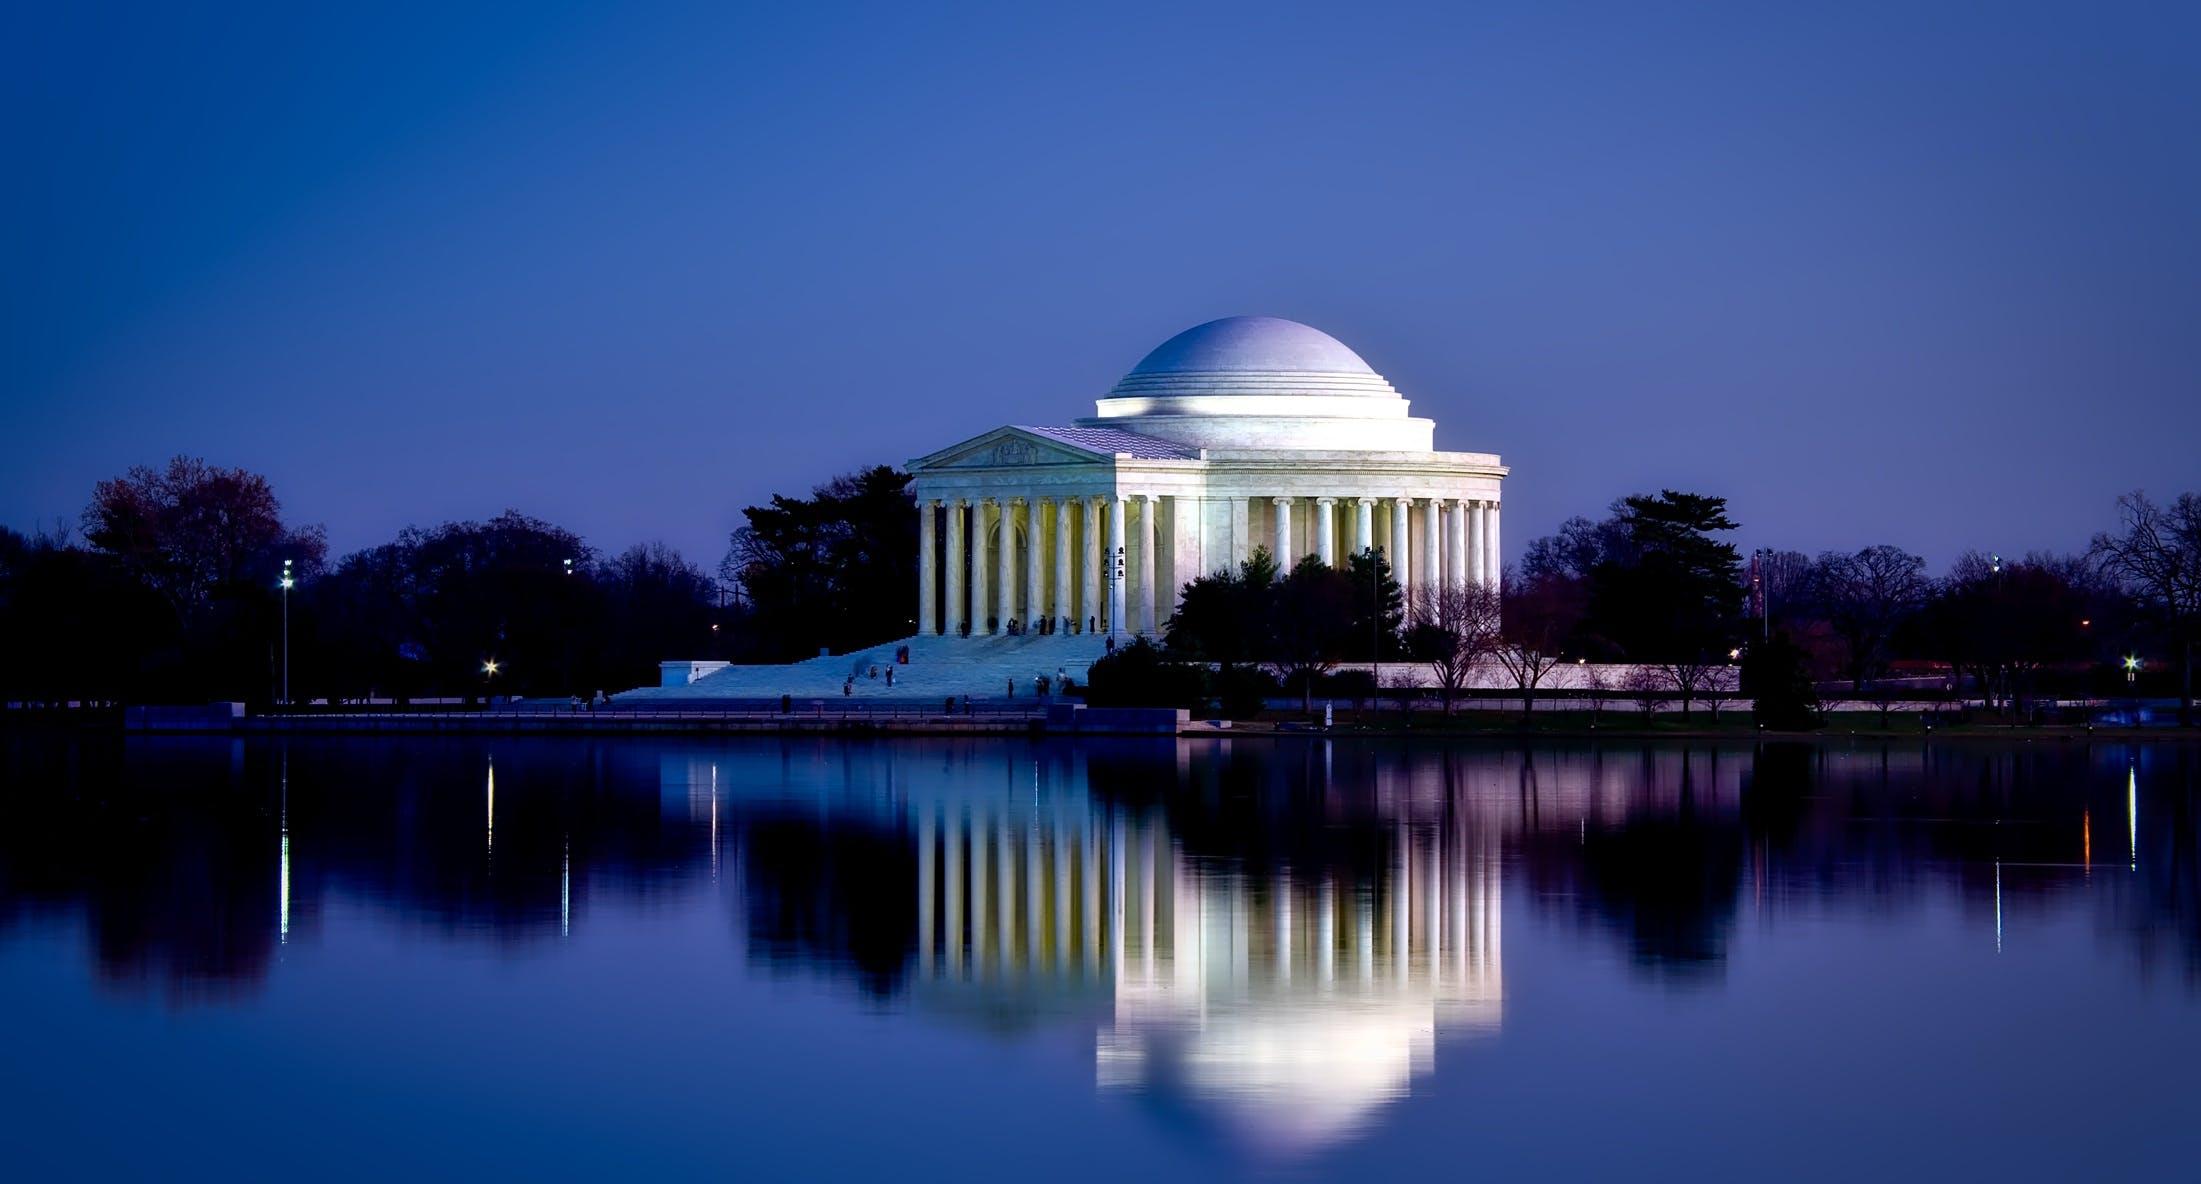 architecture, beautiful, building